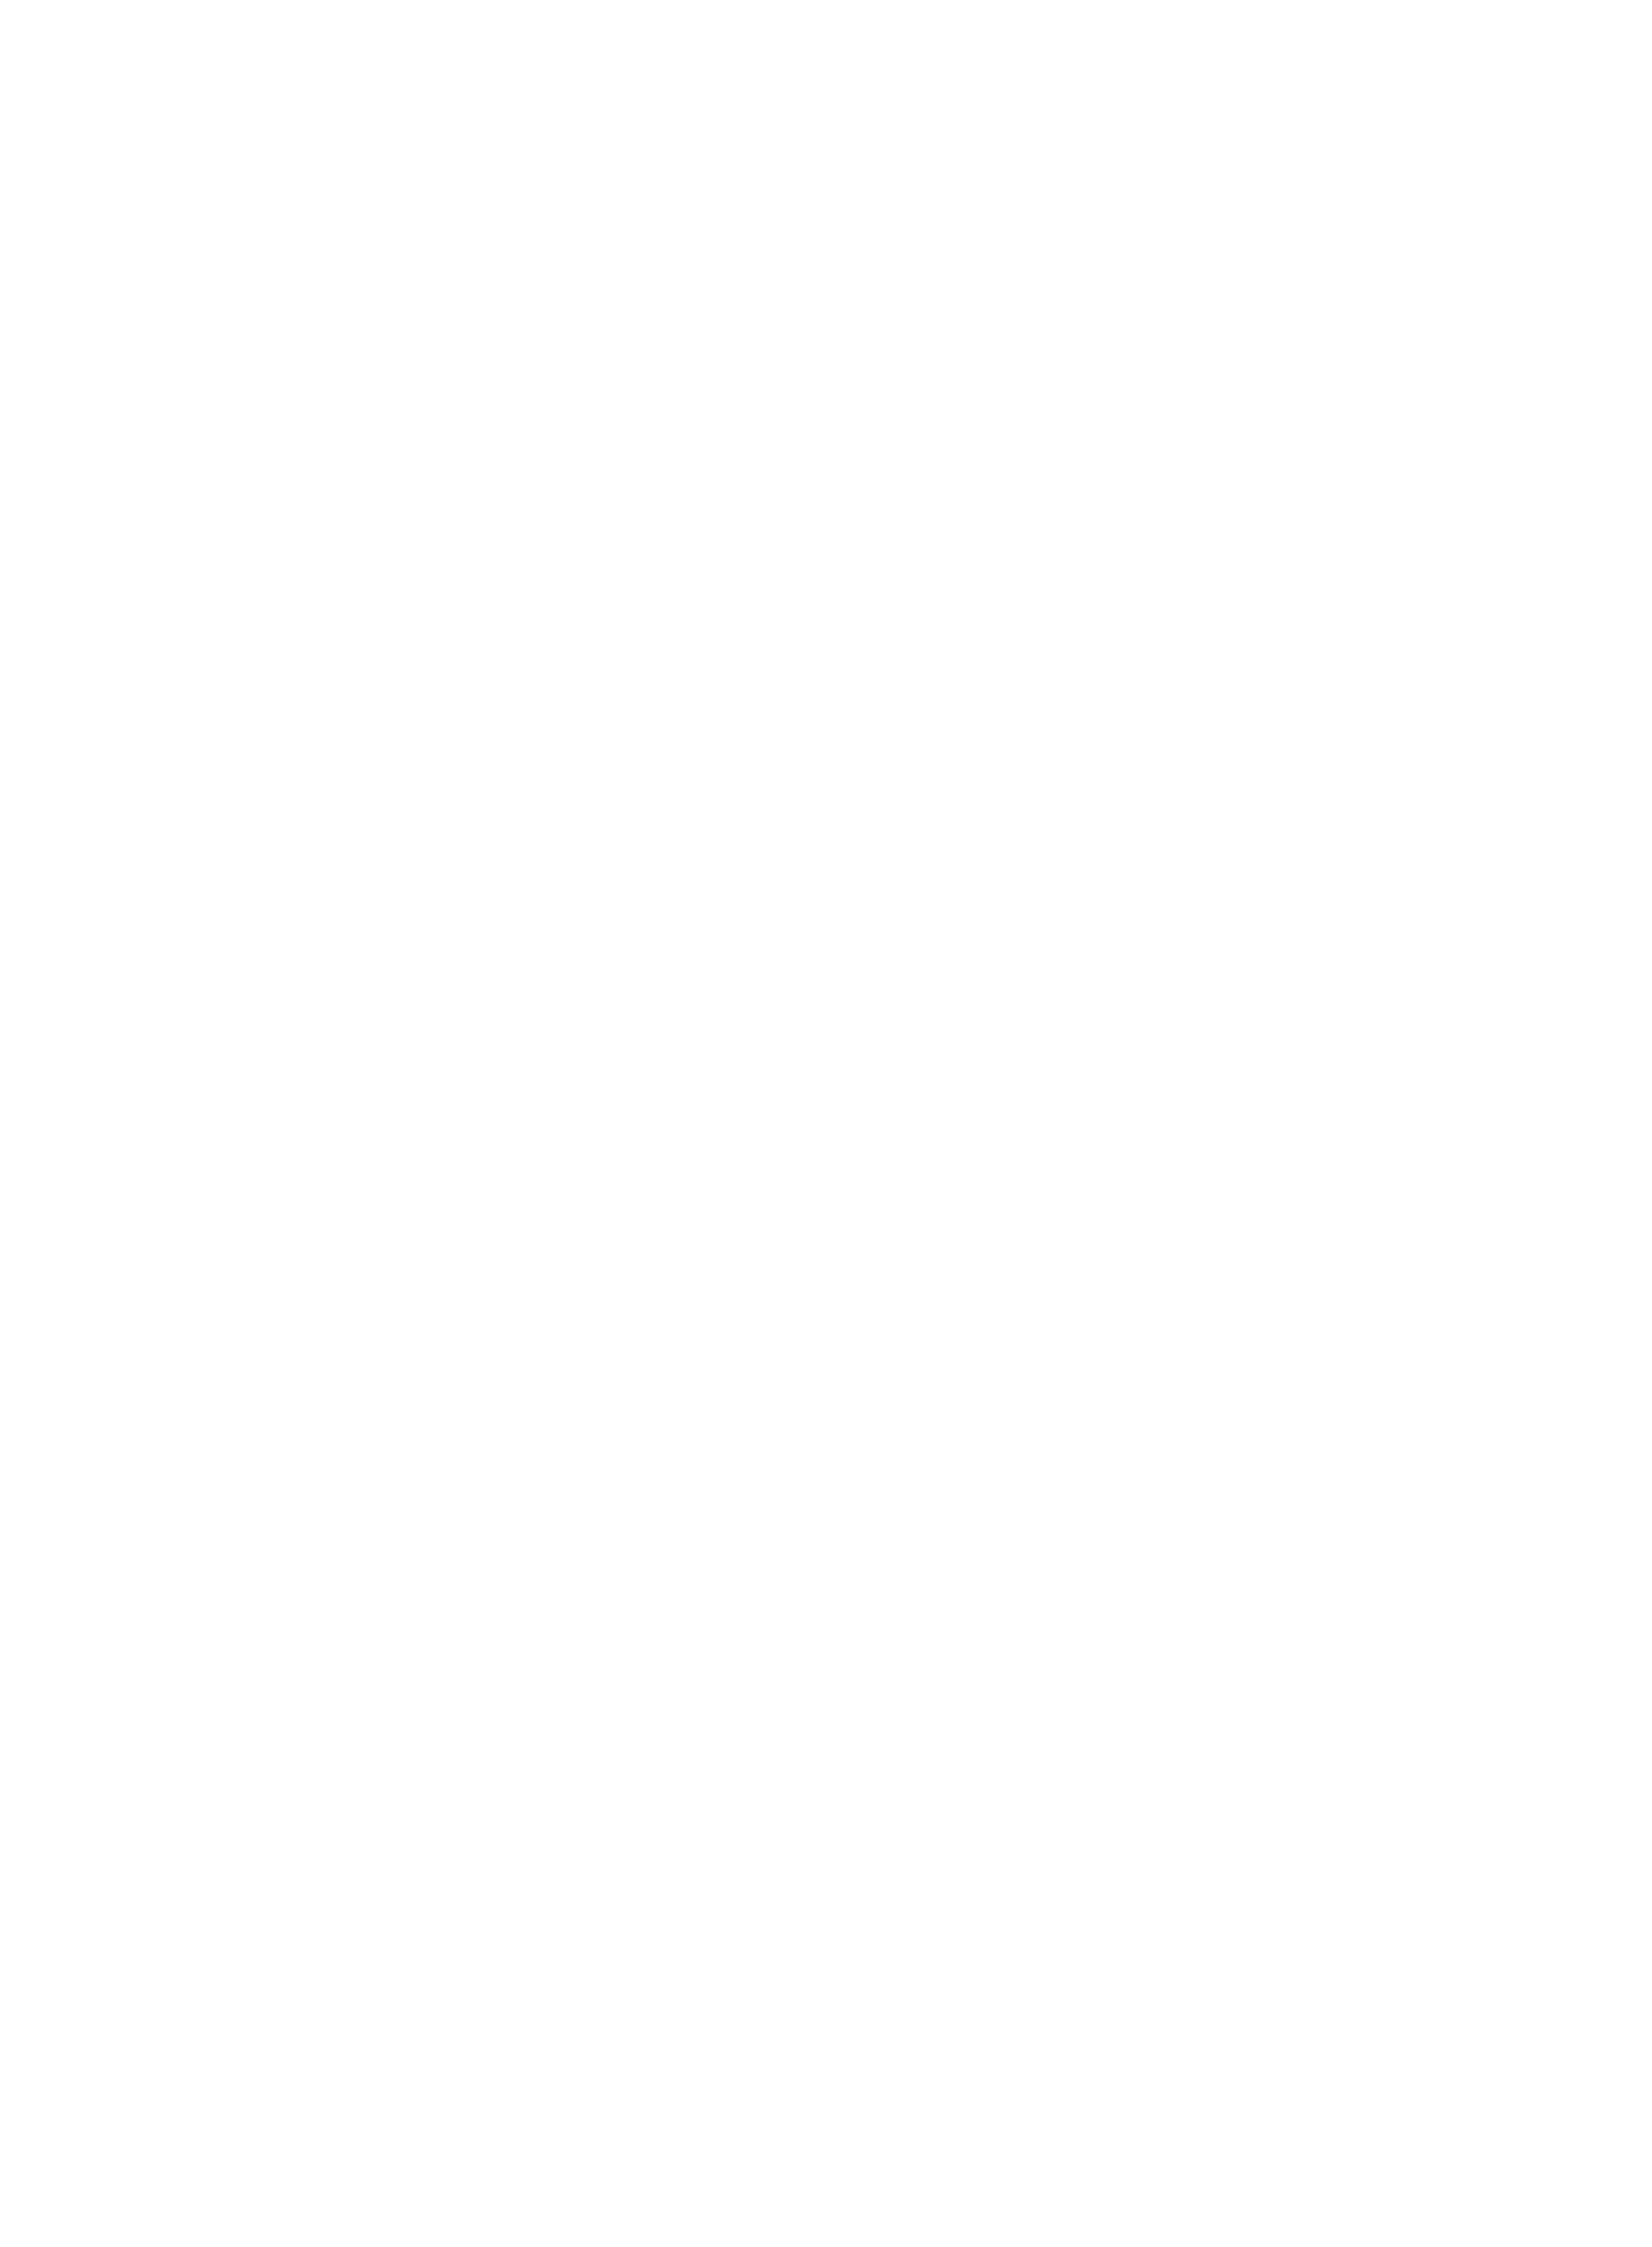 St David's Cardiff